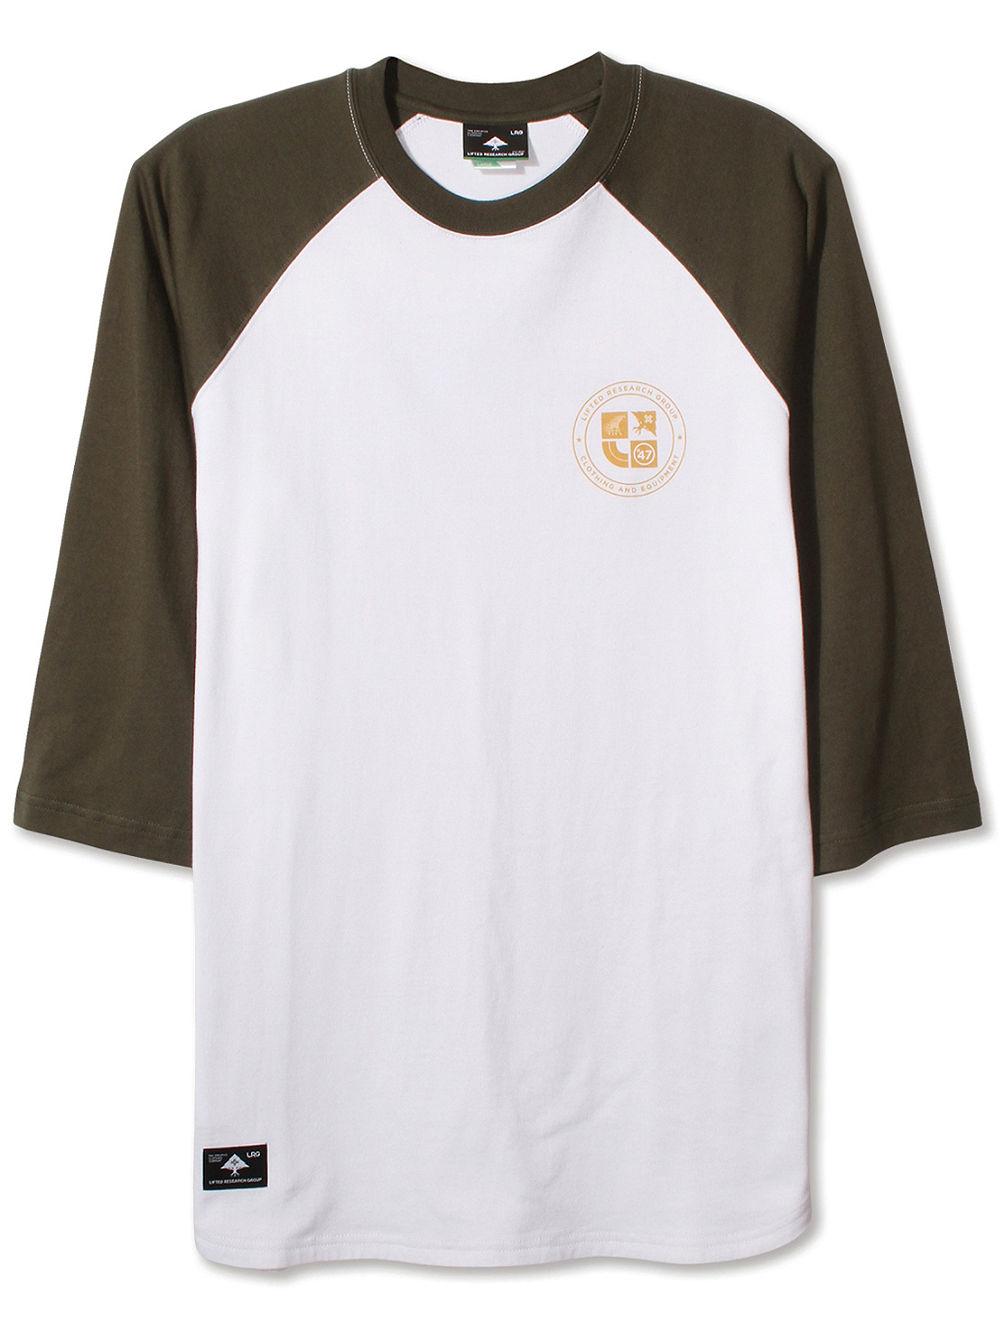 lrg-clothing-equipment-34-t-shirt-ls